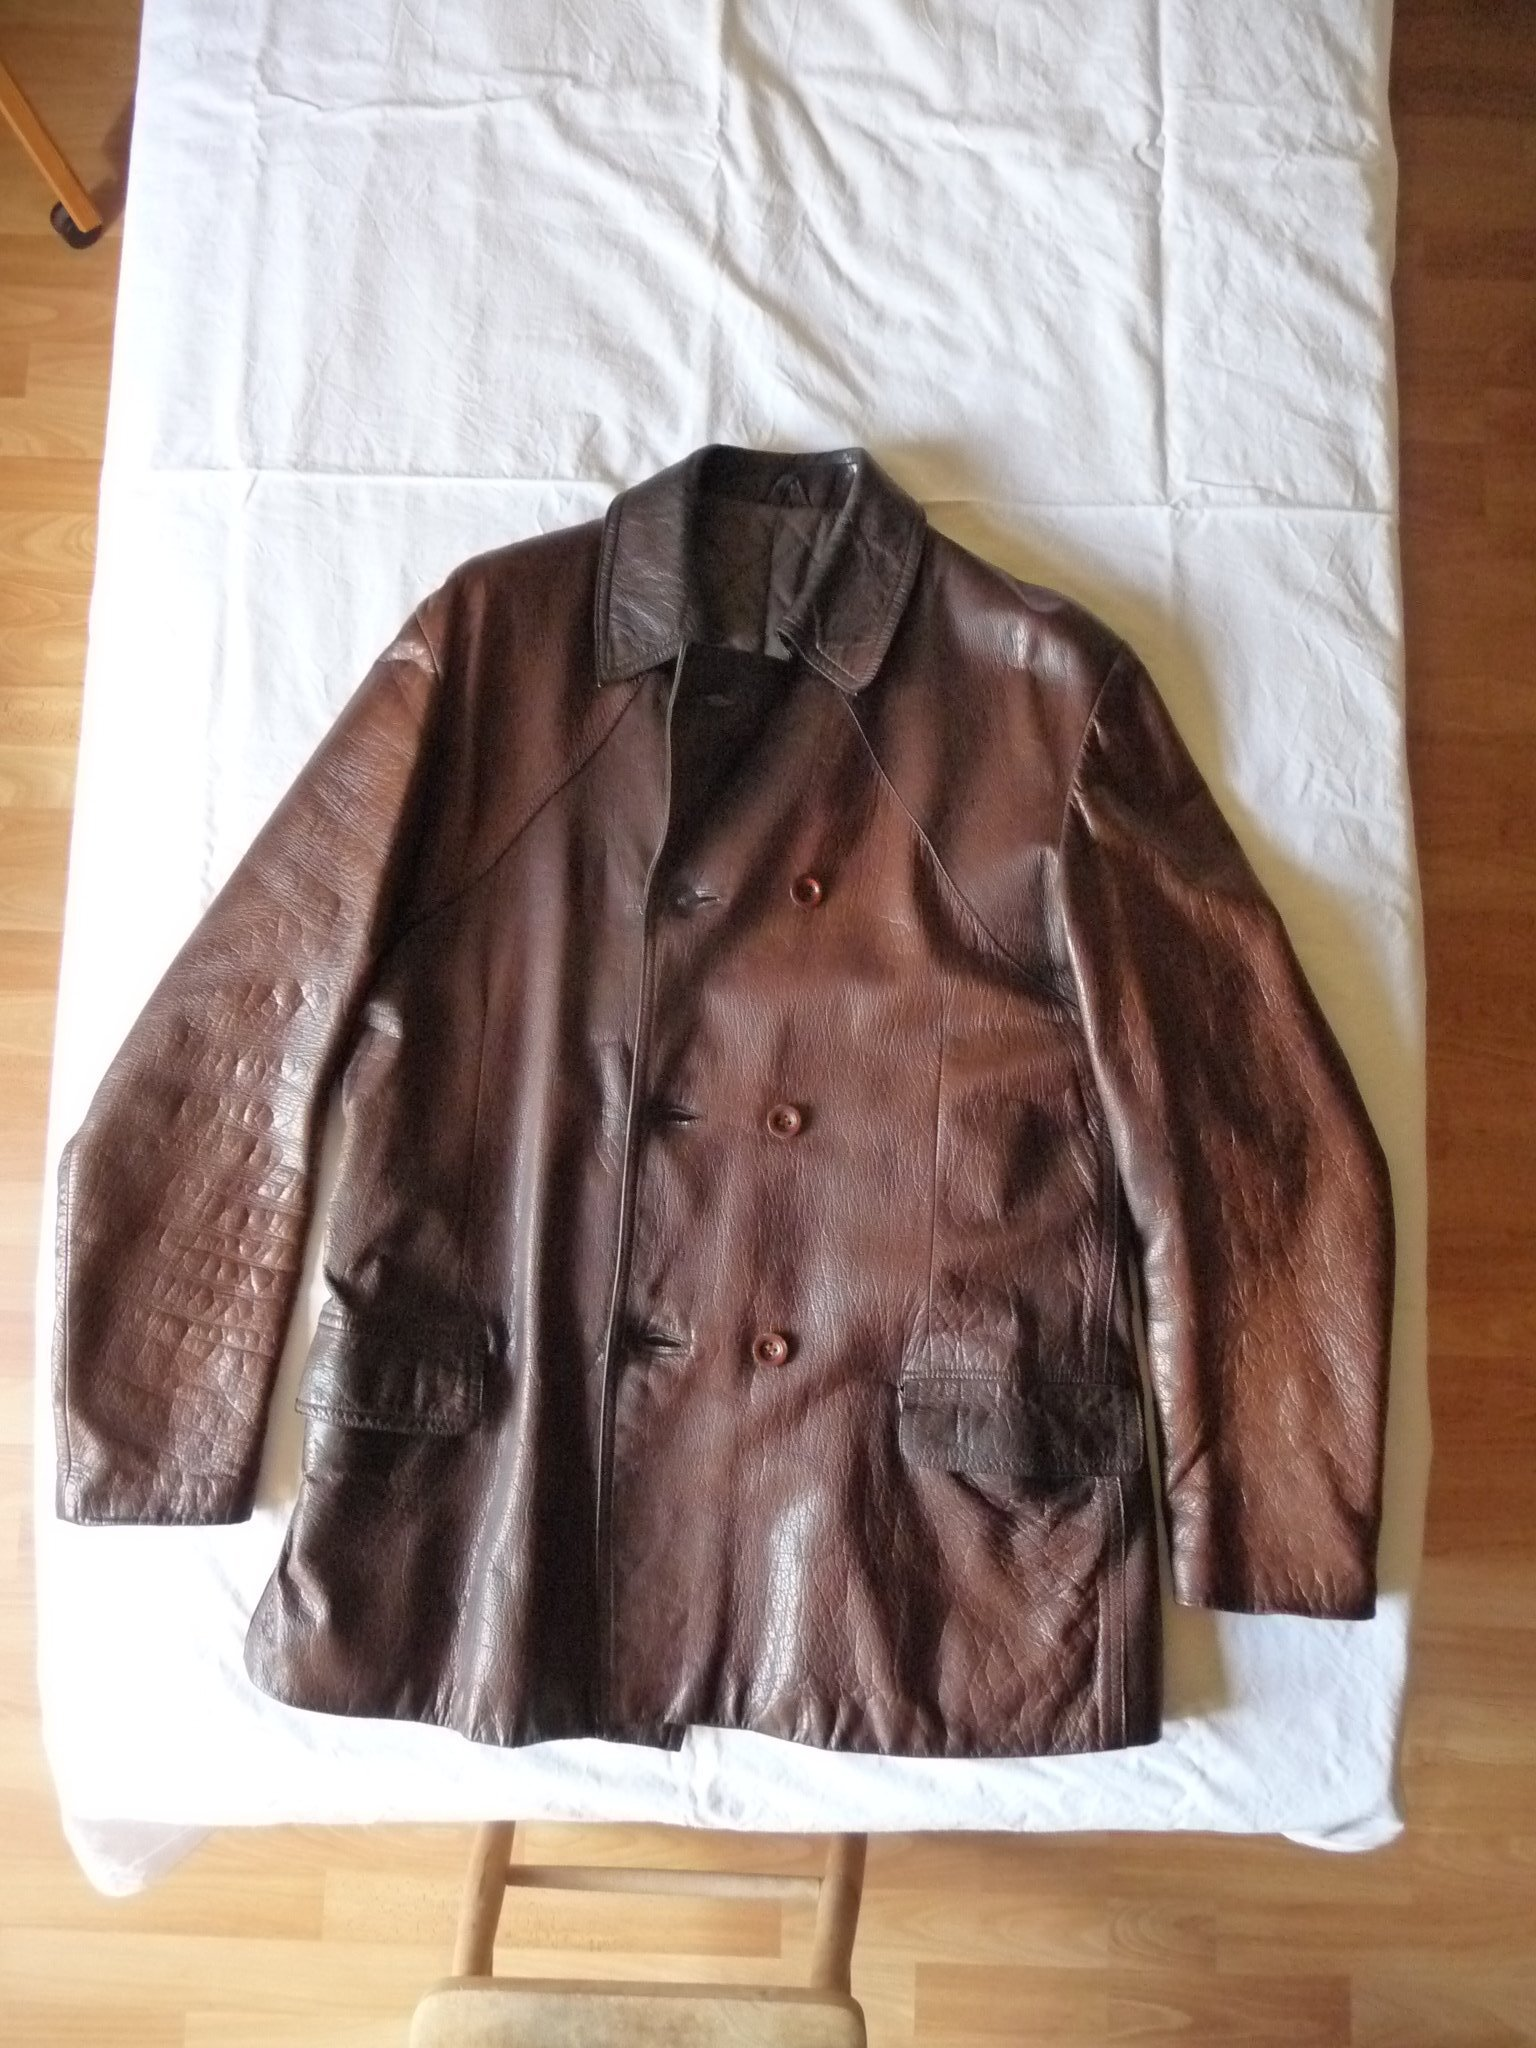 Vintage skinjacka stl 52 med nytt foder. (421350418) ᐈ Köp